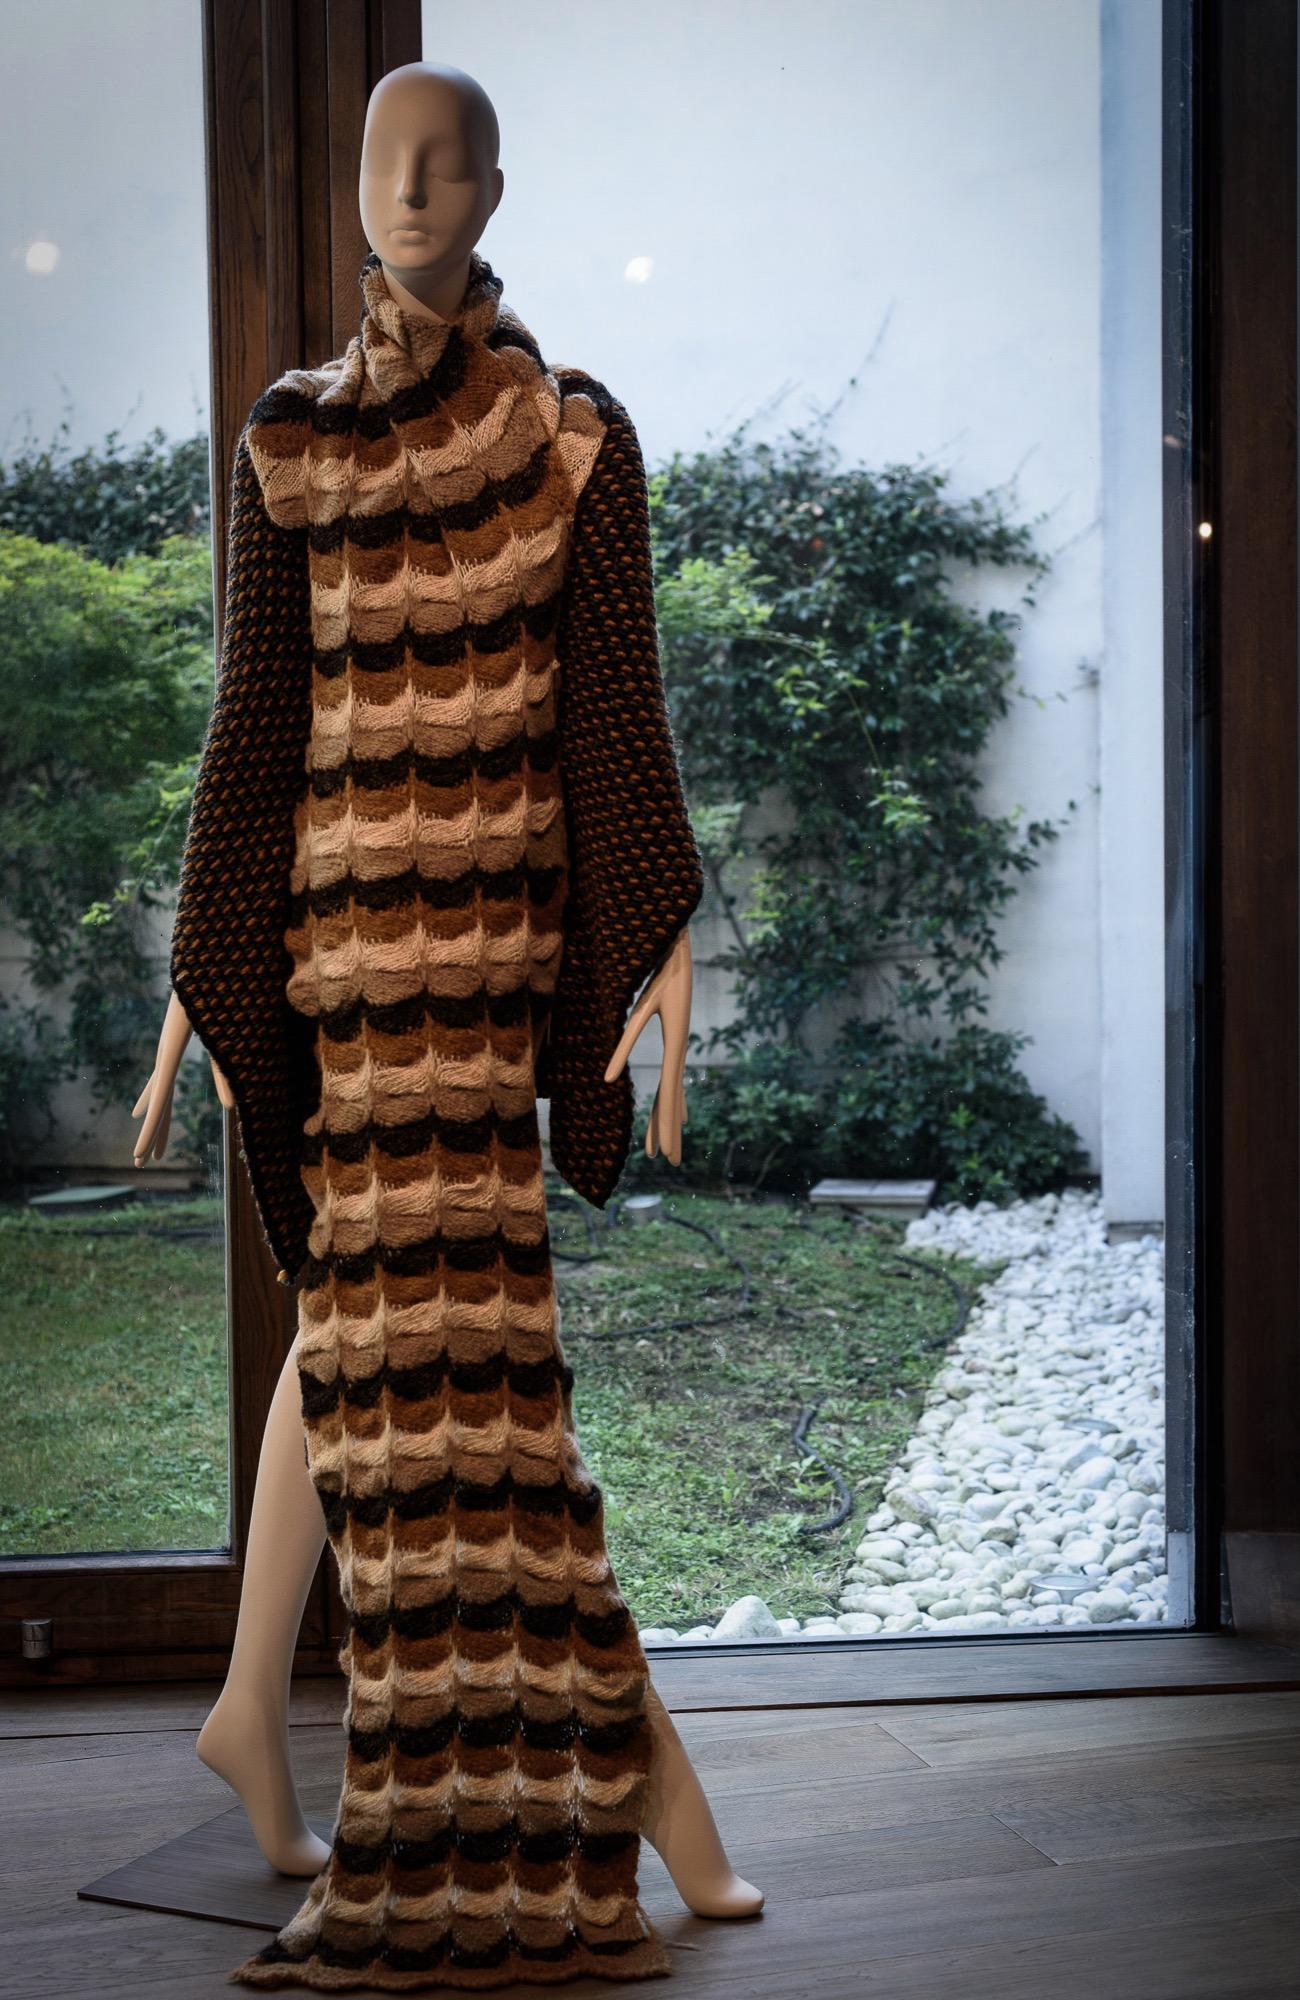 Schläppi Aloof female mannequin In Linea Piu yarns for exhibition at BonaveriMilano